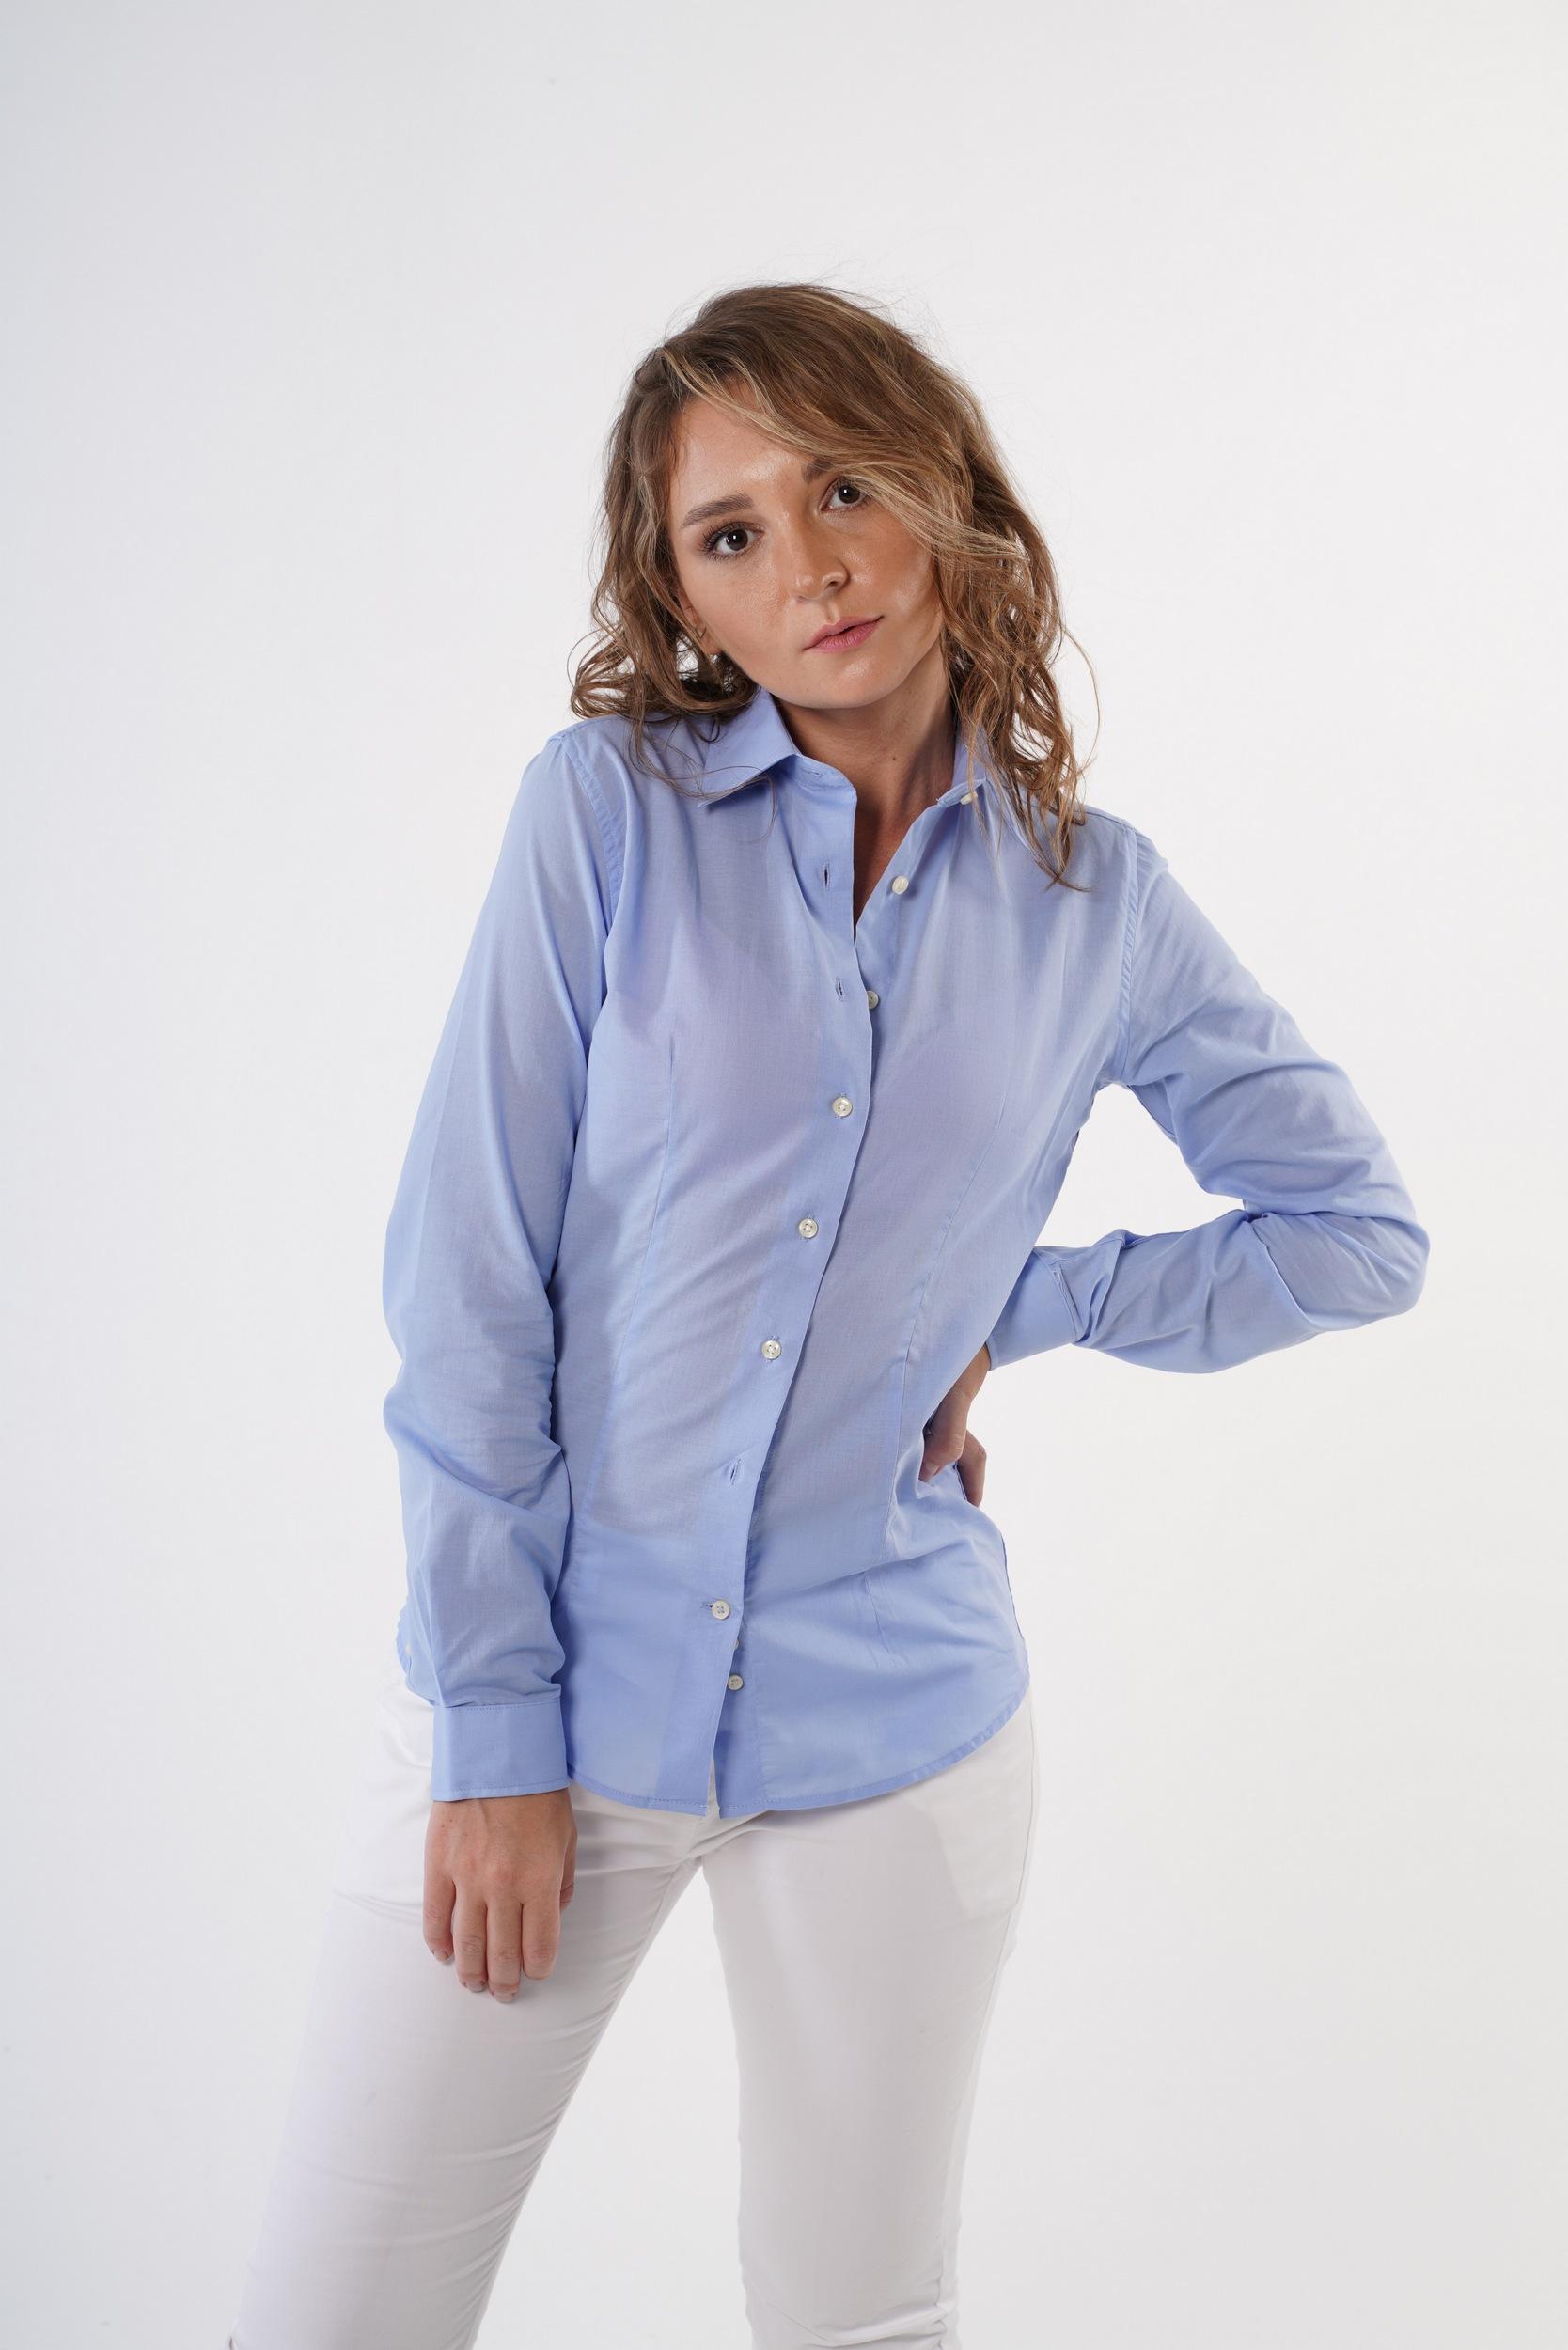 Camisa Azul Formal Mulher